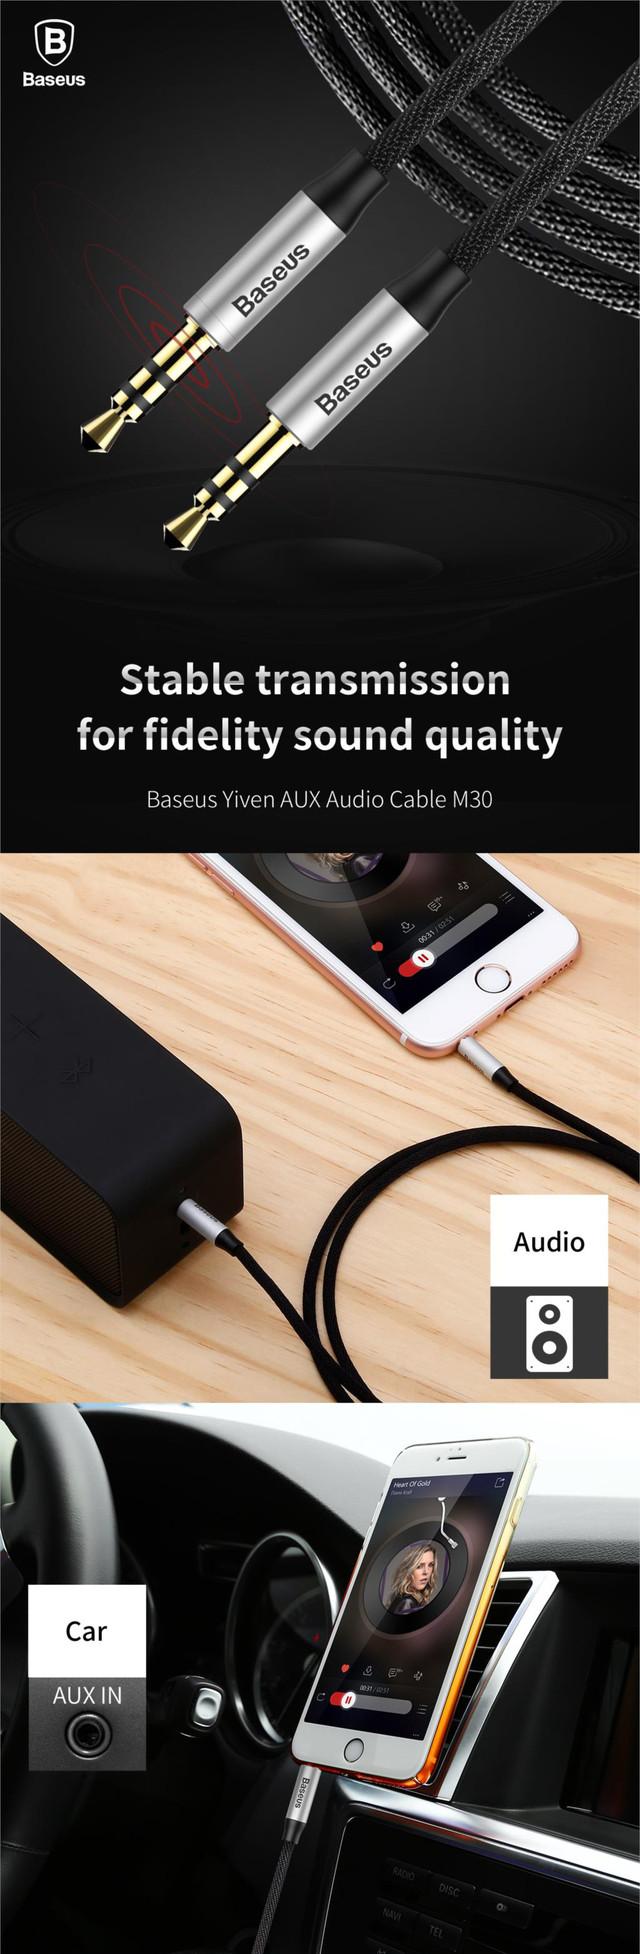 Baseus М30 Yiwen аудио кабель AUX 3.5mm jack